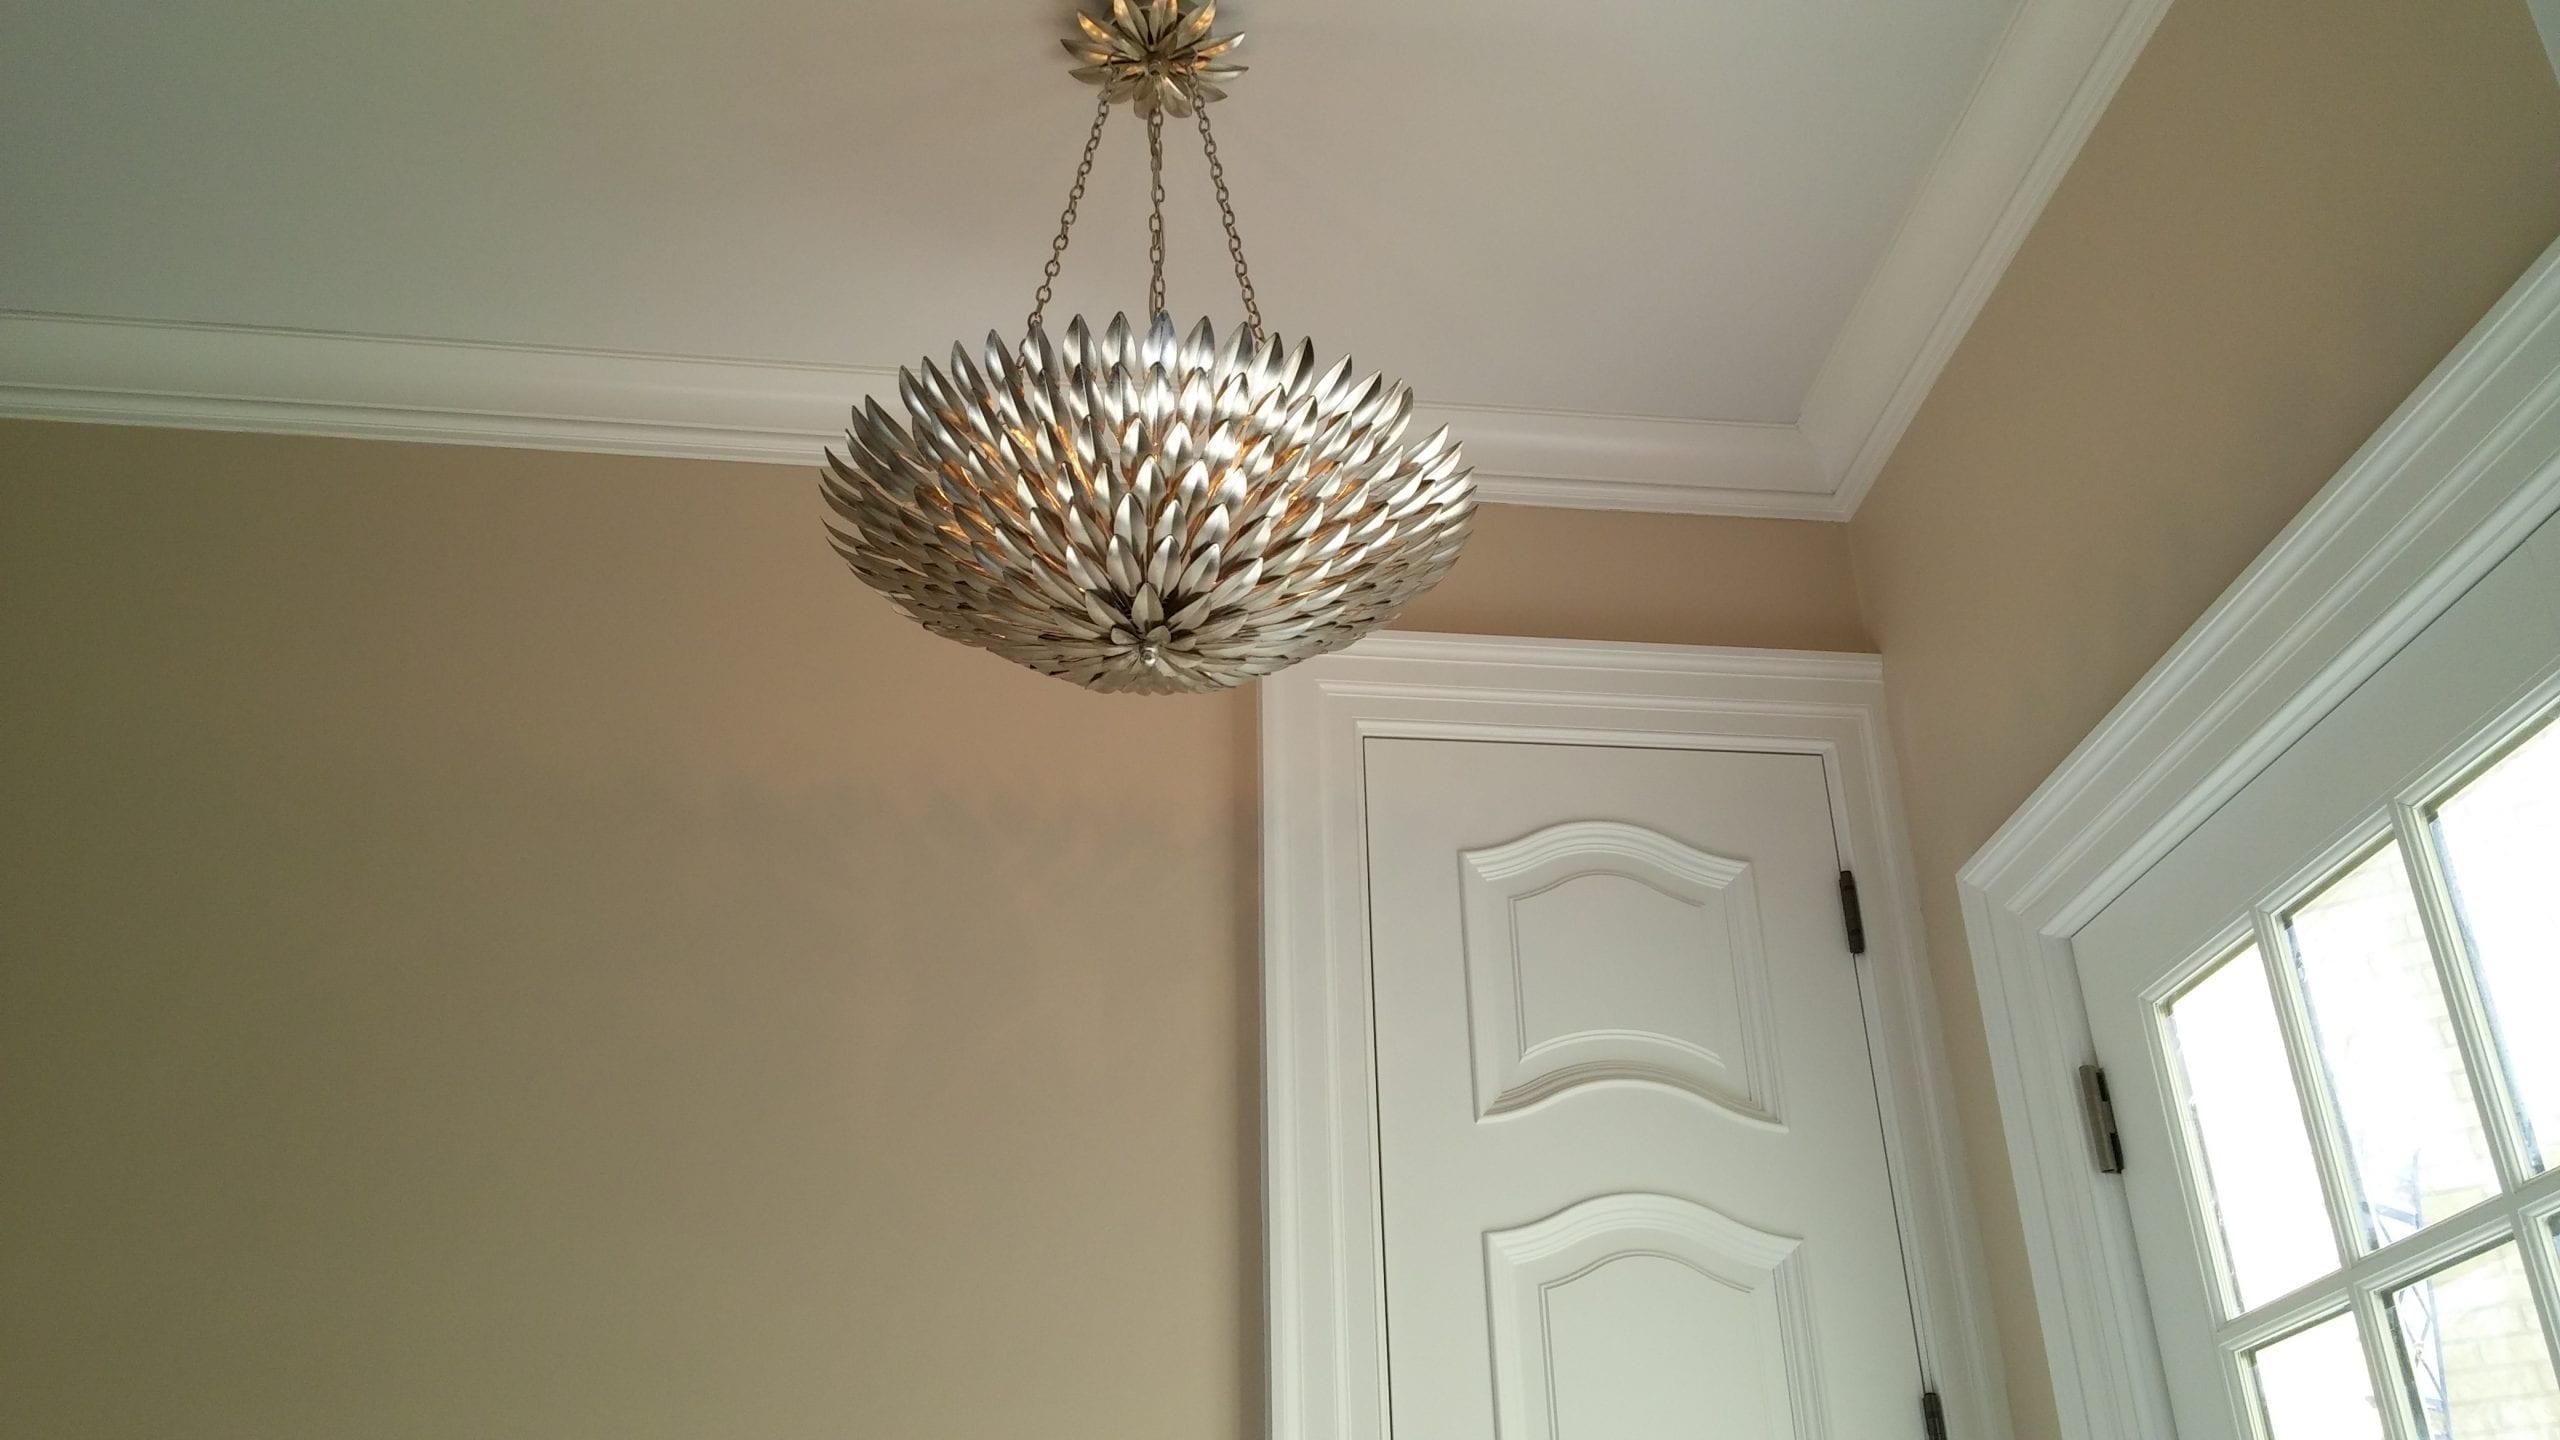 Decorative Lighting Fixture